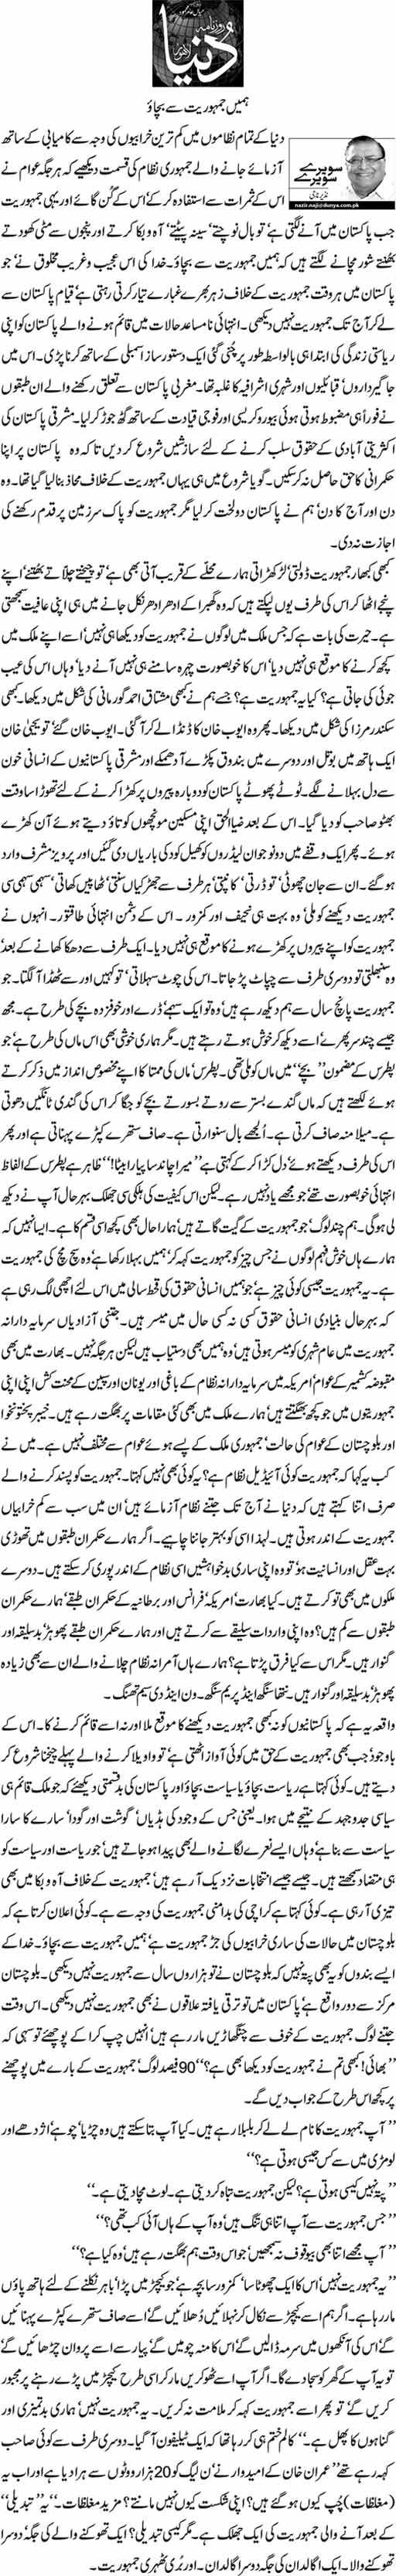 Hamain jumhooriyyat se bachao - Nazeer Naji